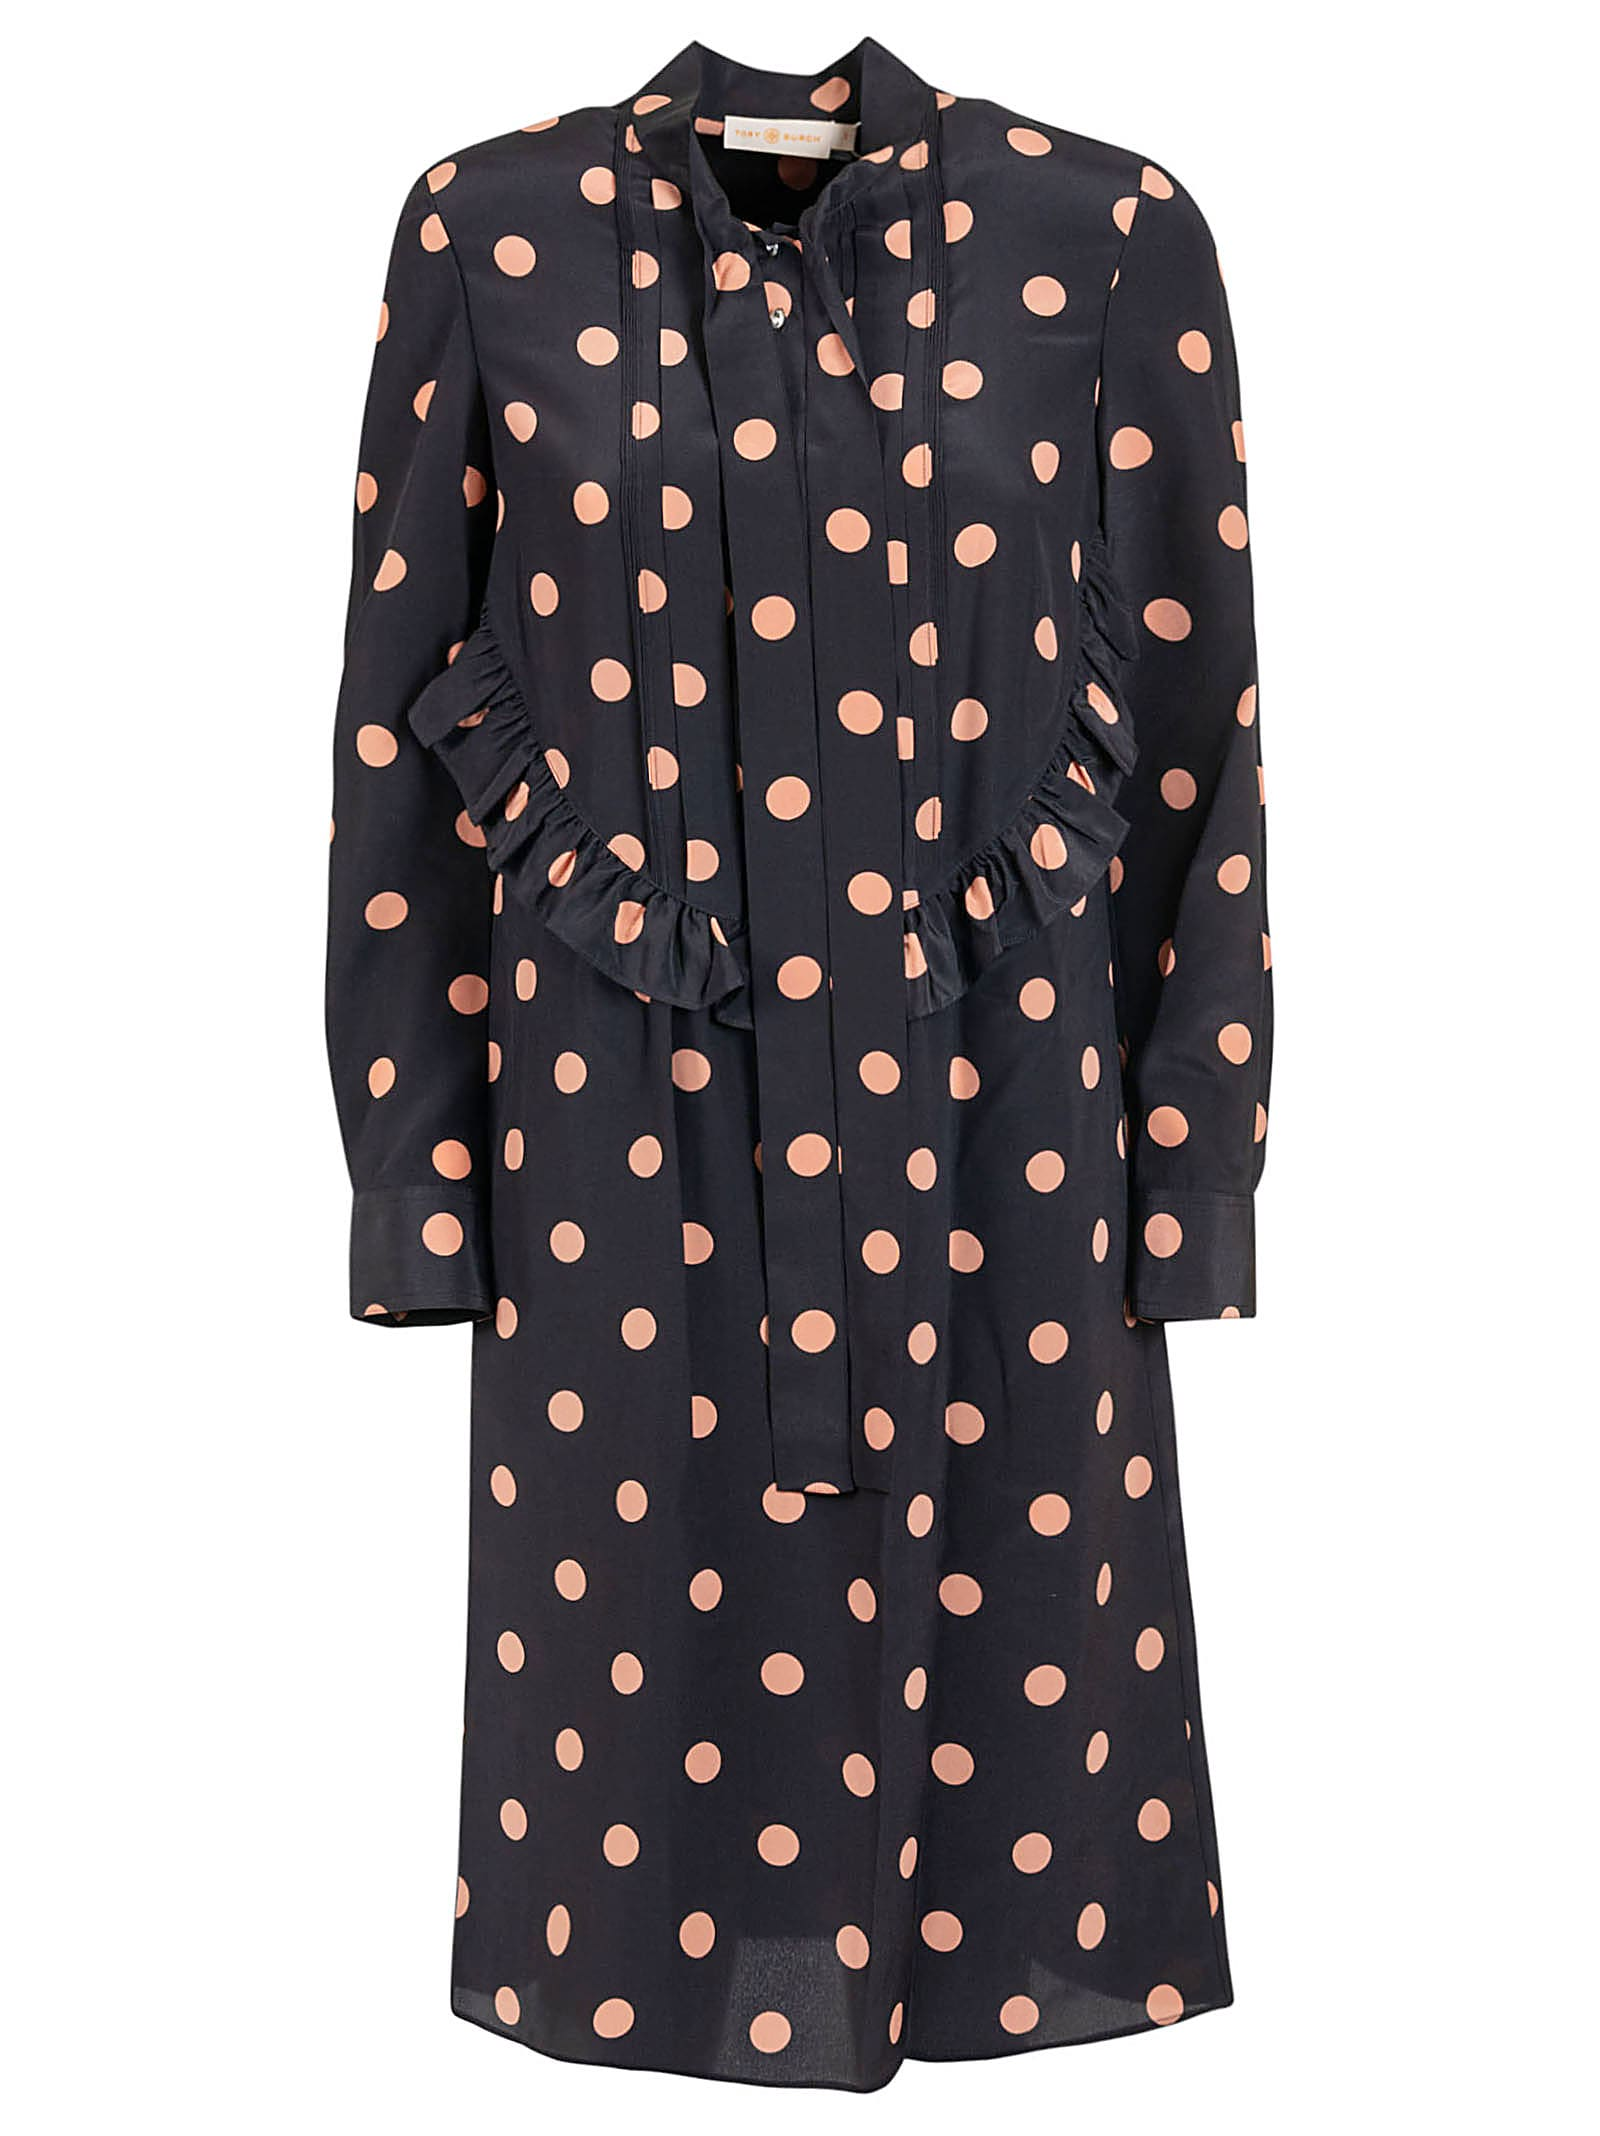 Tory Burch Printed Ruffled Bow Dress